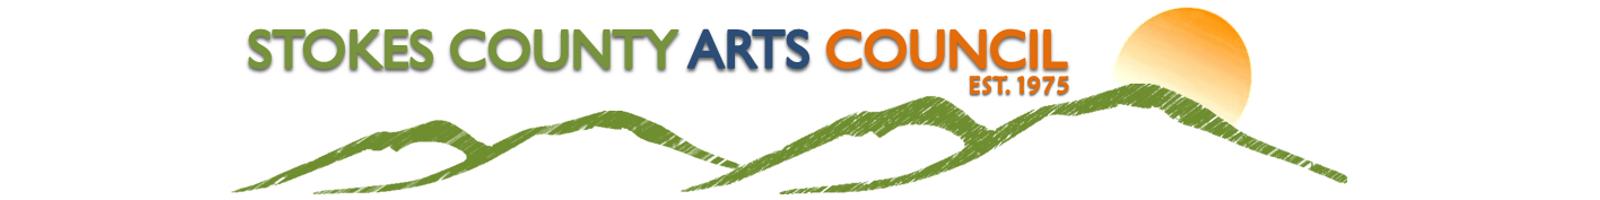 Stokes County Arts Council Residency @ Stokes County Arts Council | Danbury | North Carolina | United States